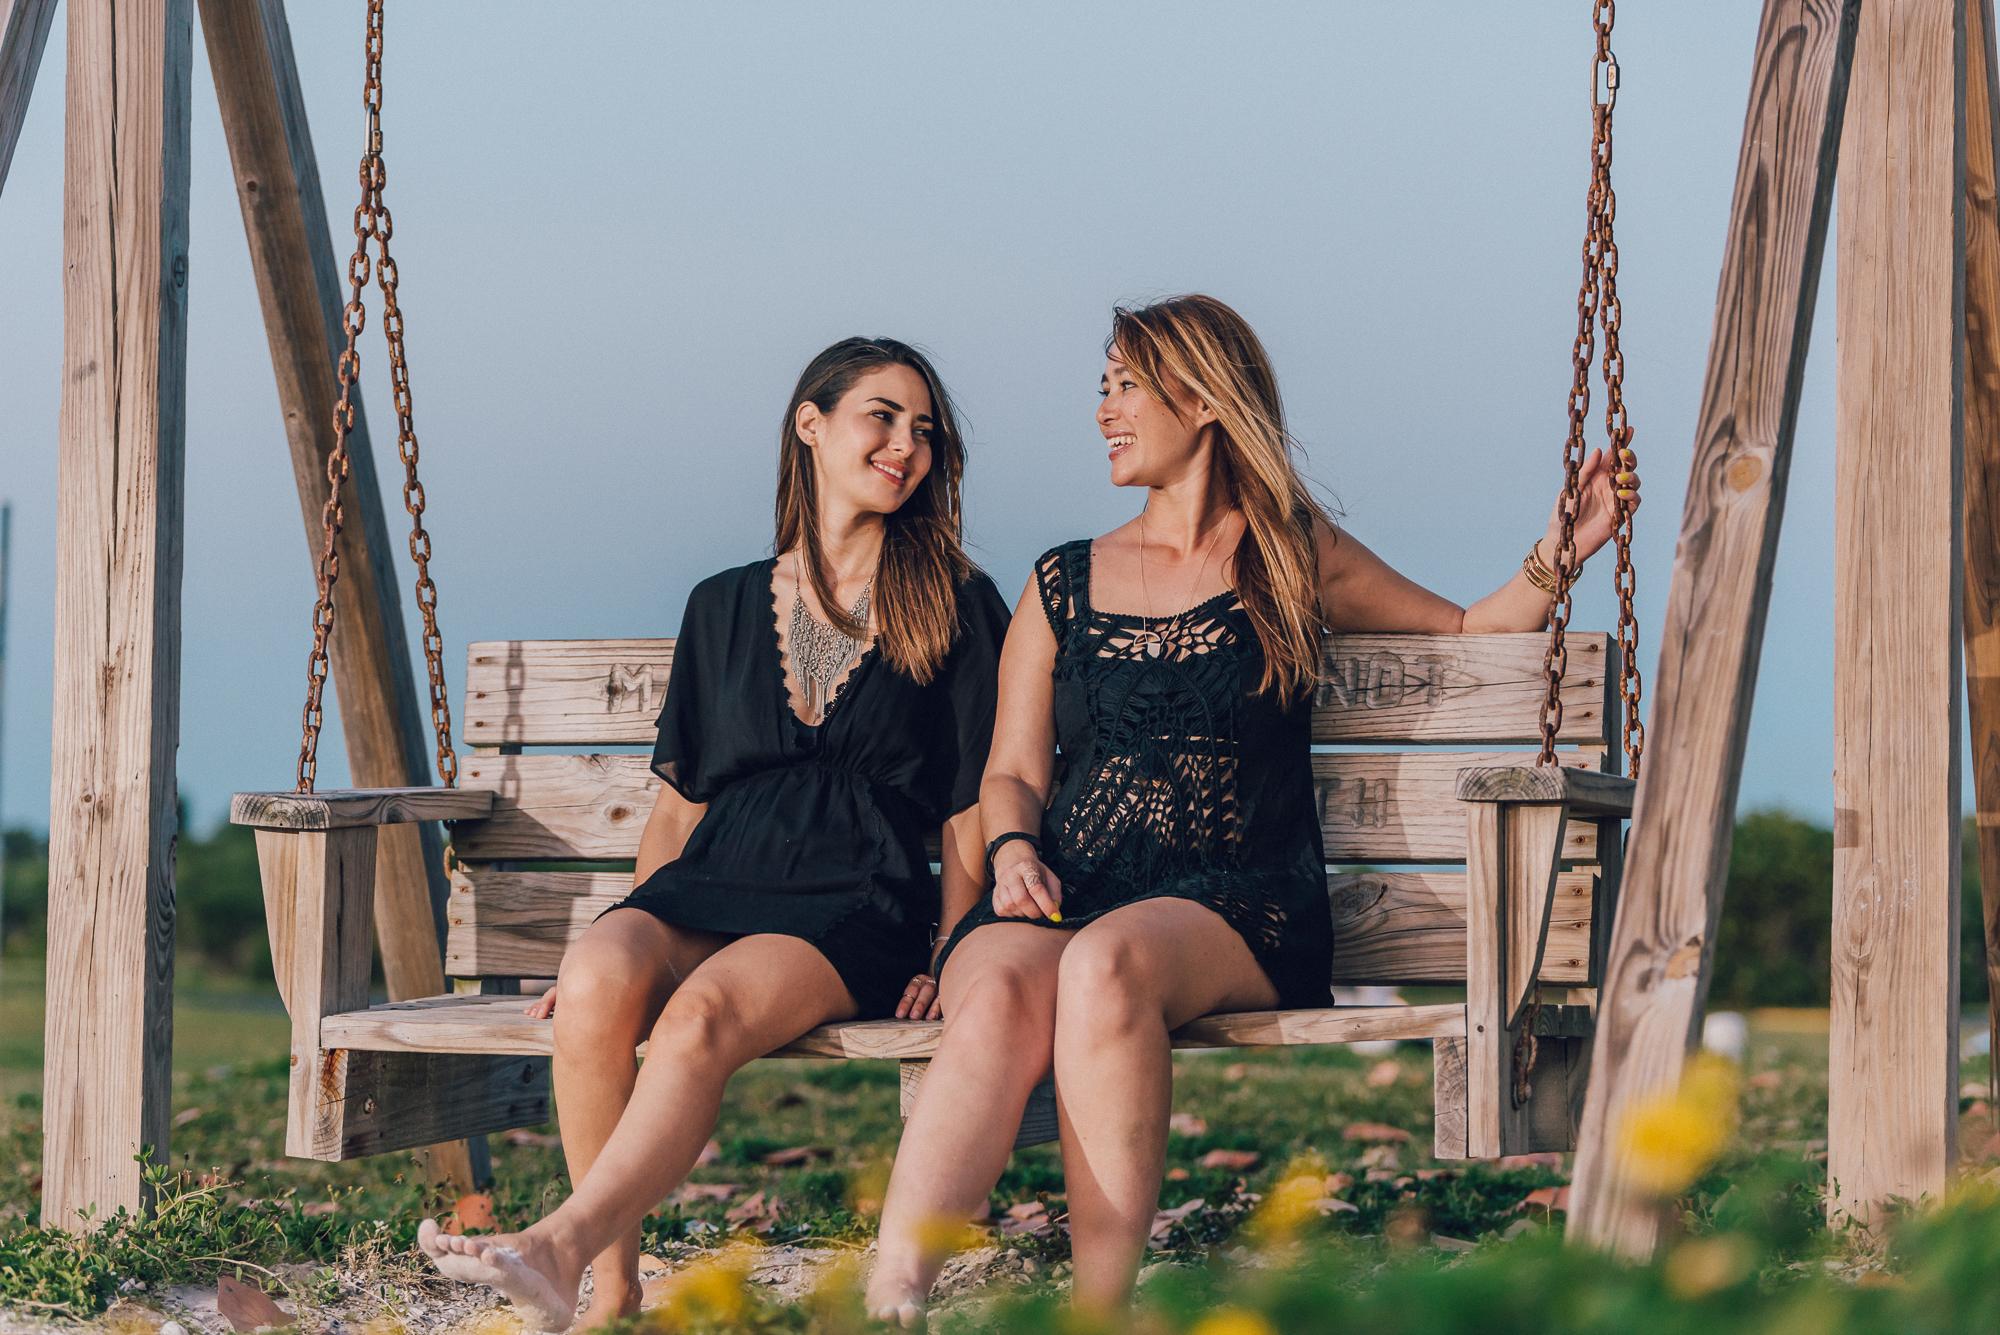 Cute bench swings at Honeymoon Island